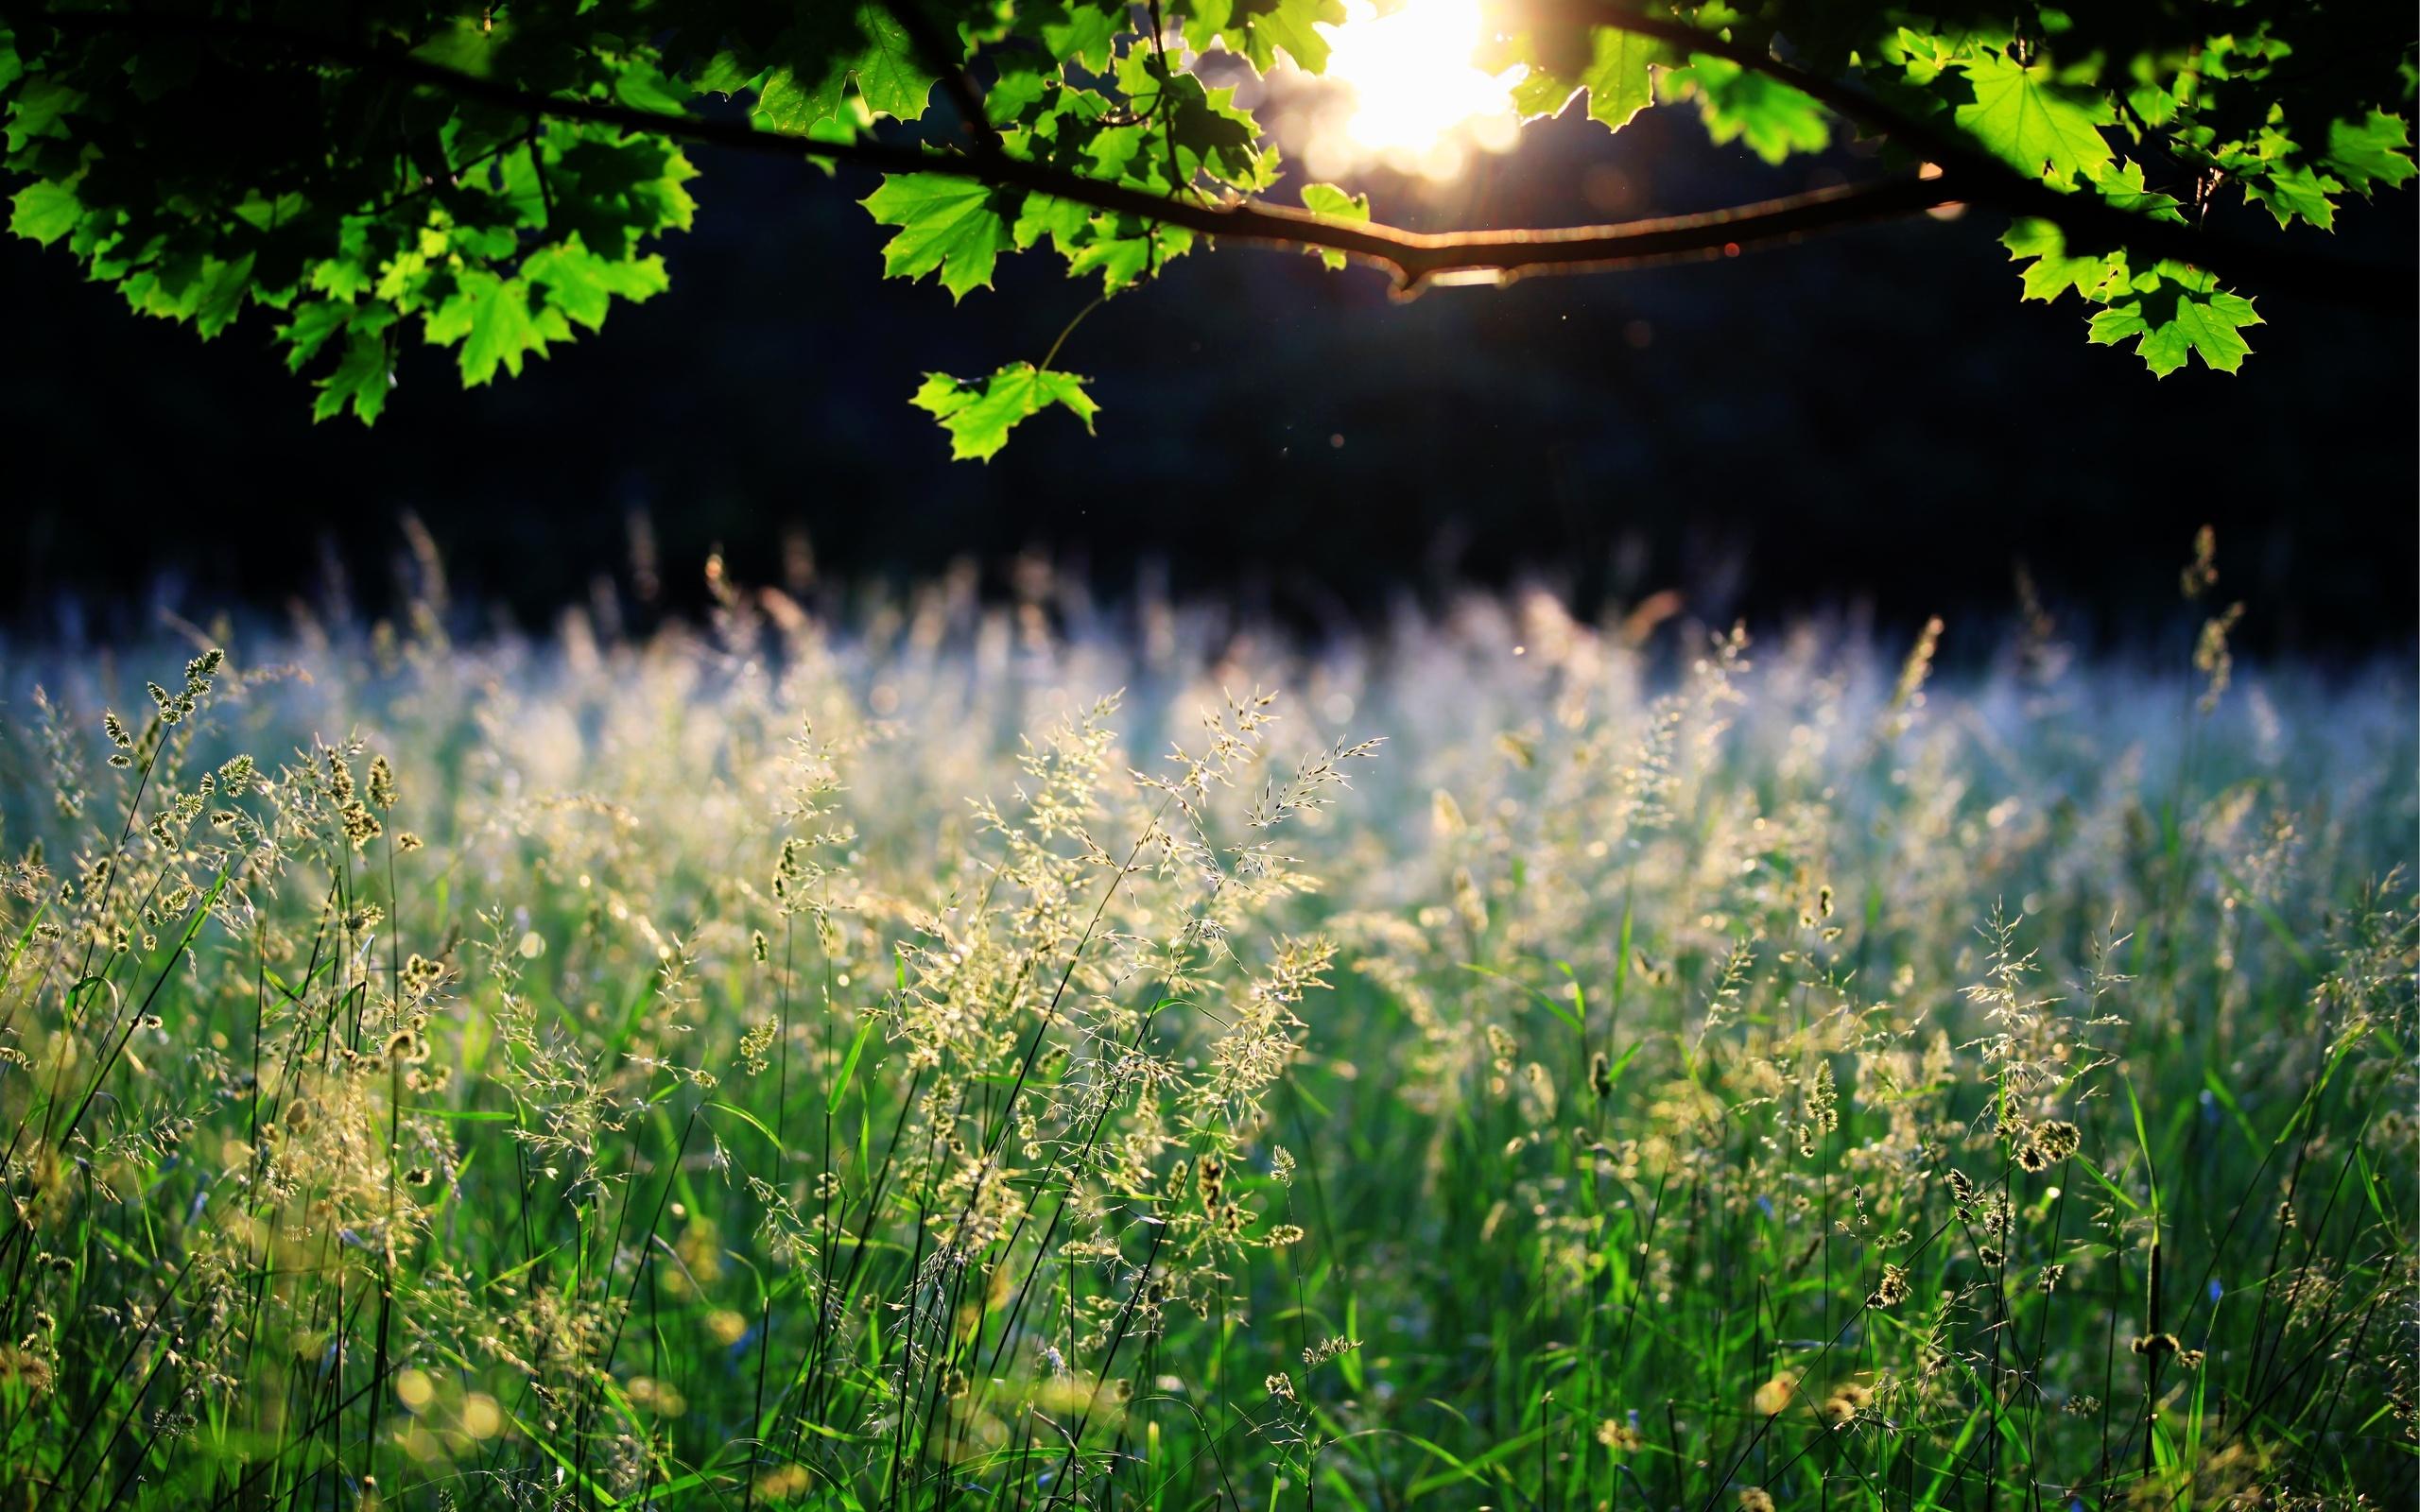 лето трава солнце картинки процессе жарки